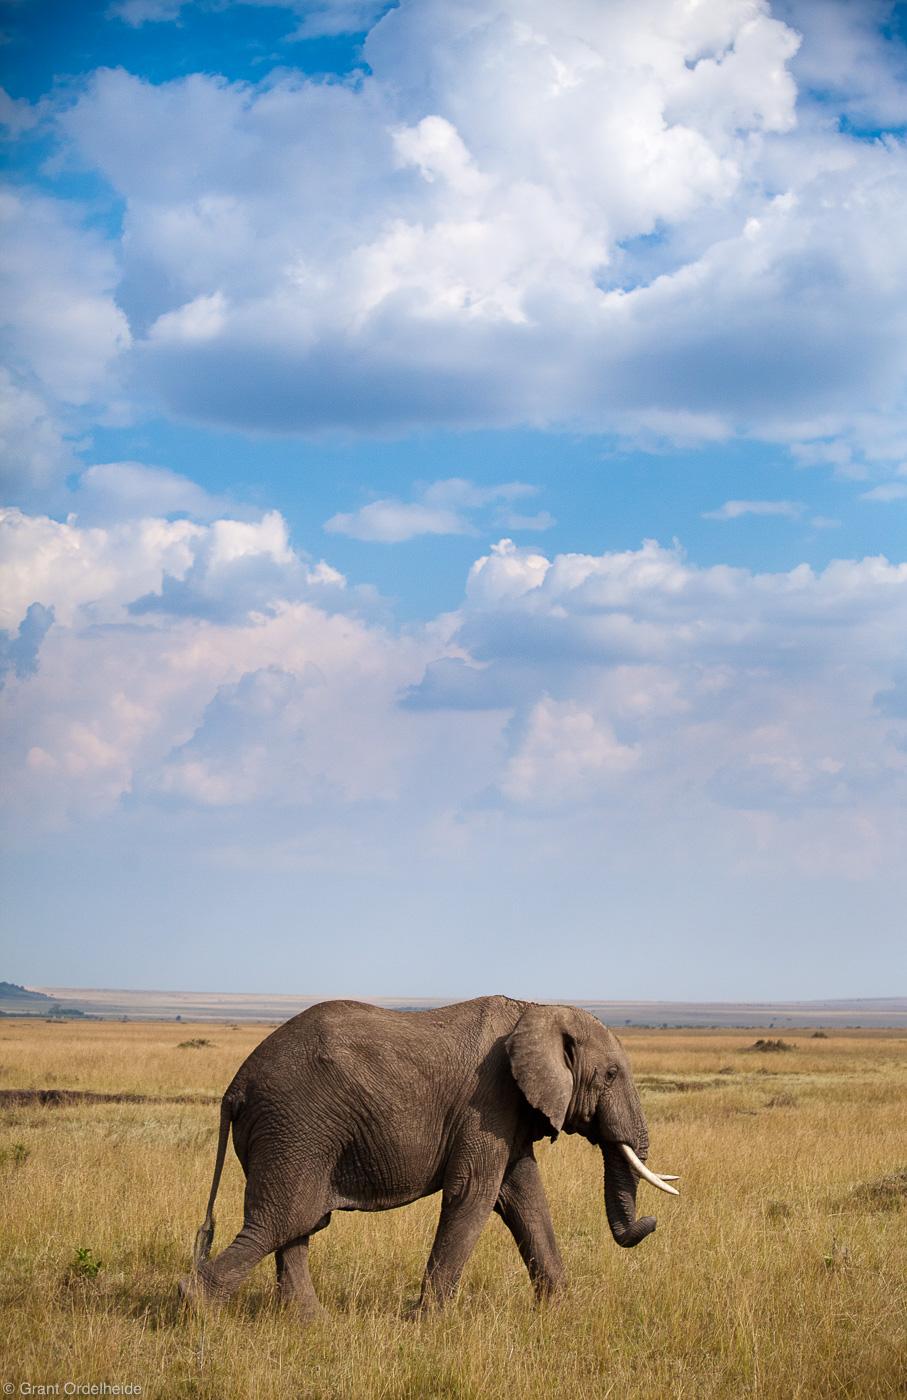 elephant, masai, mara, kenya, africa, lone, walks, stride, grasslands, beautiful sky, photo